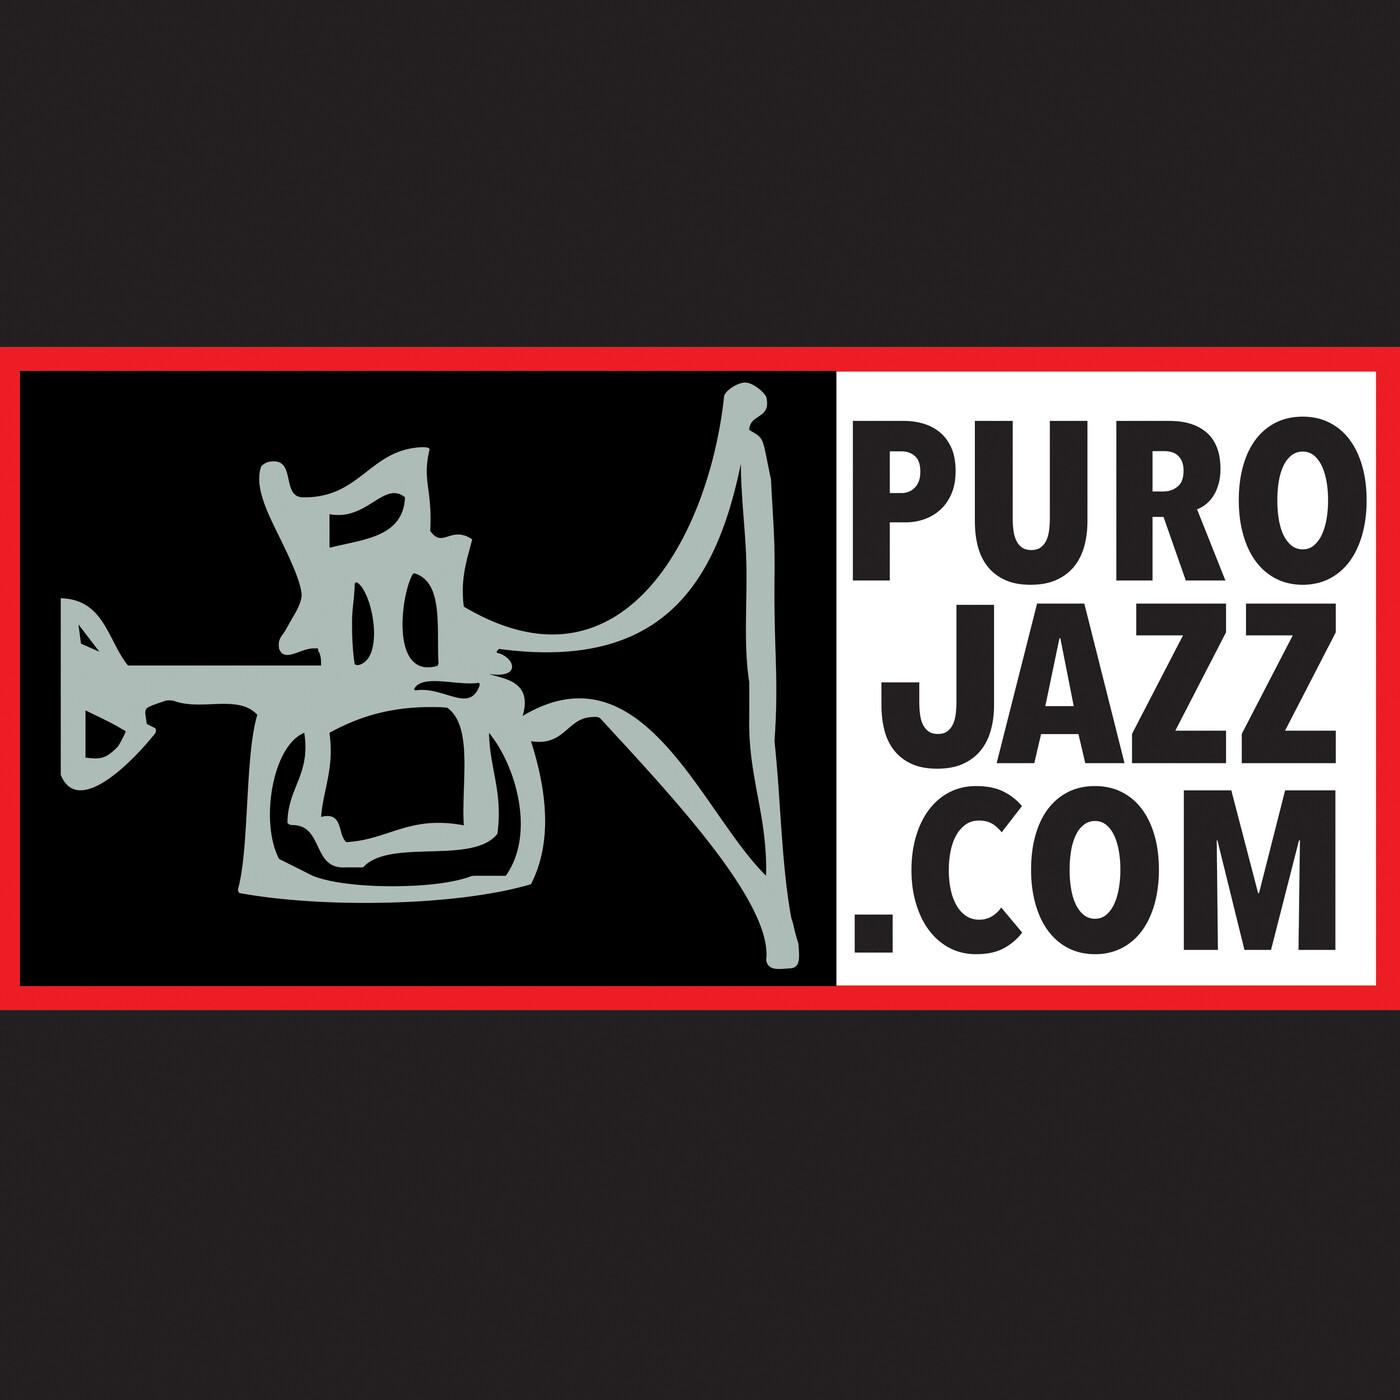 P Jazz 24 septiembre